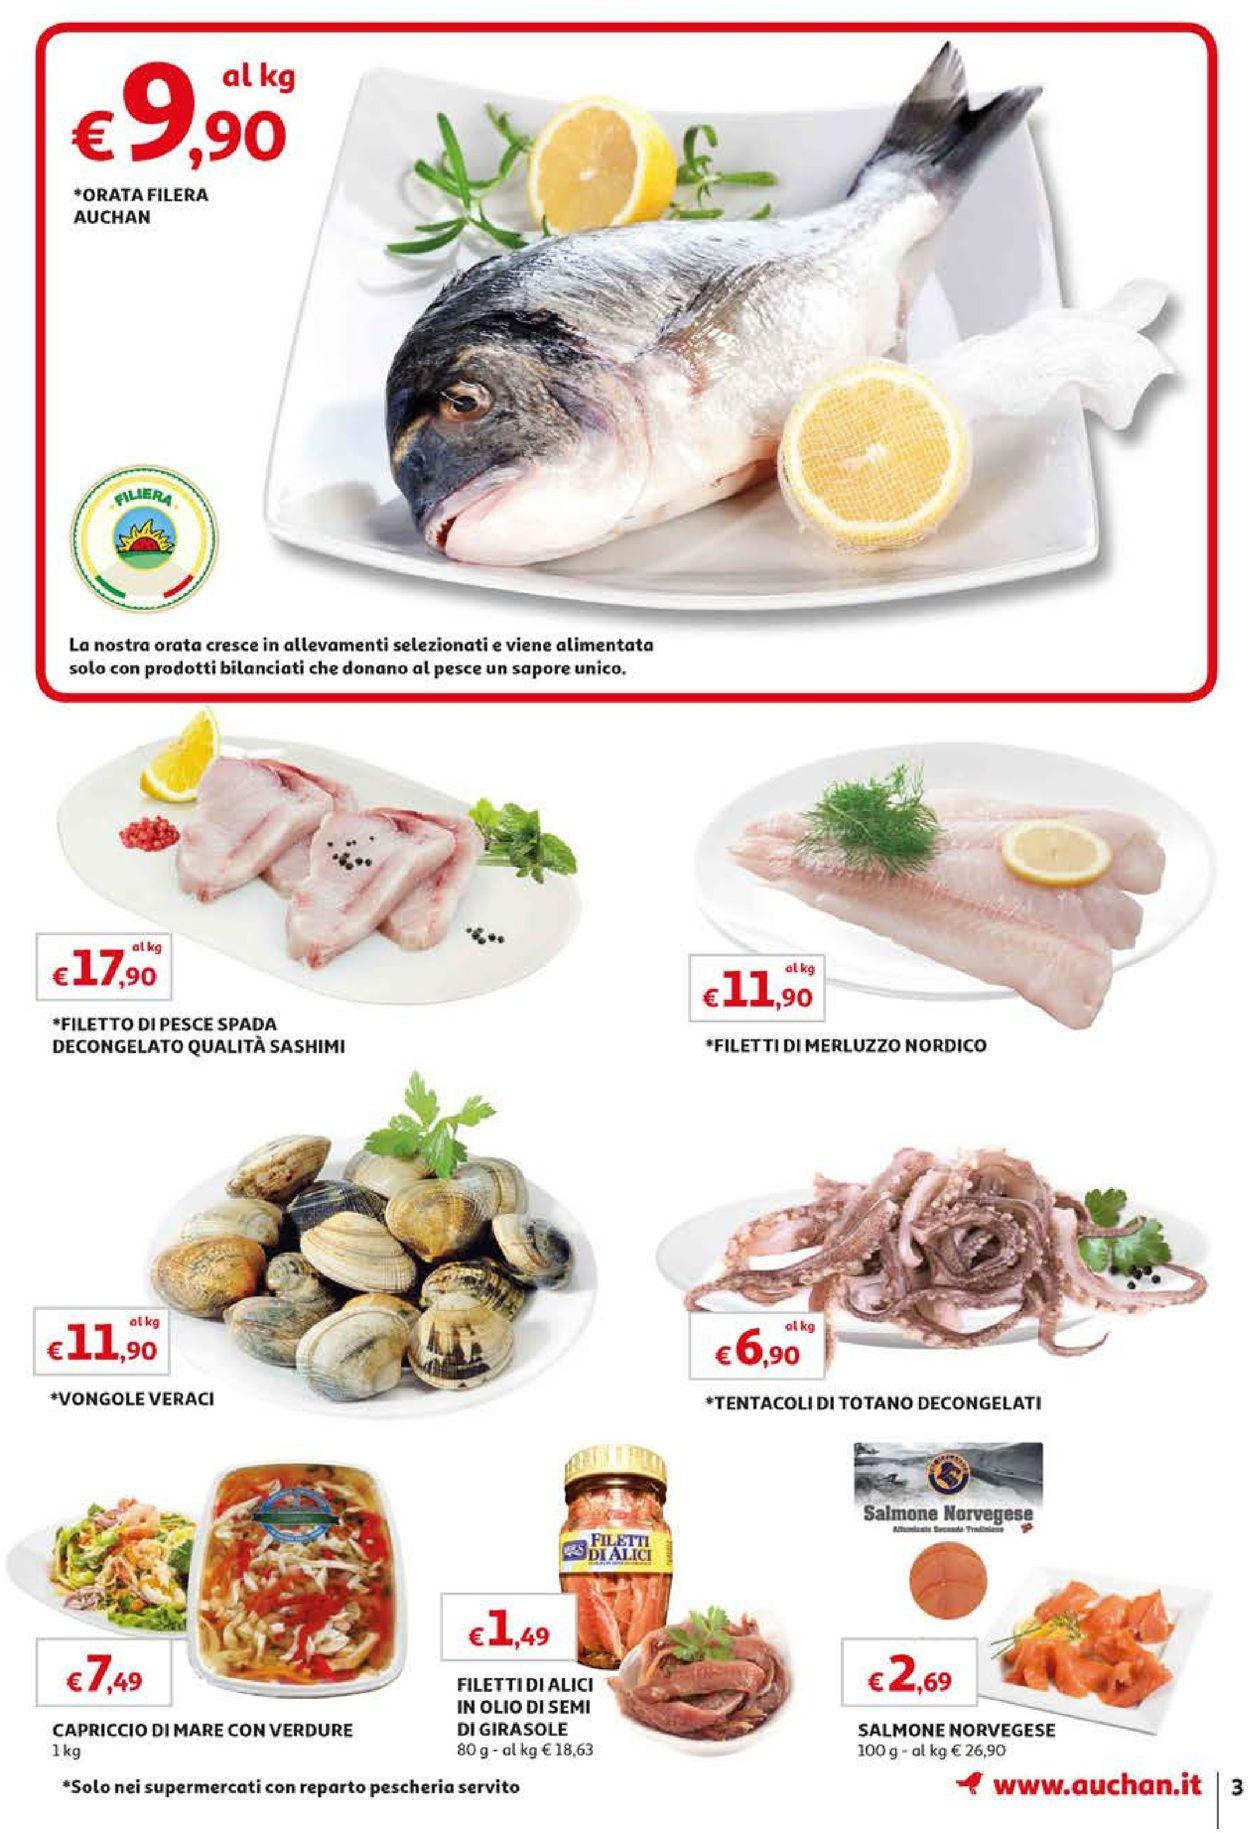 Volantino Auchan - Offerte 10/09-18/09/2019 (Pagina 3)